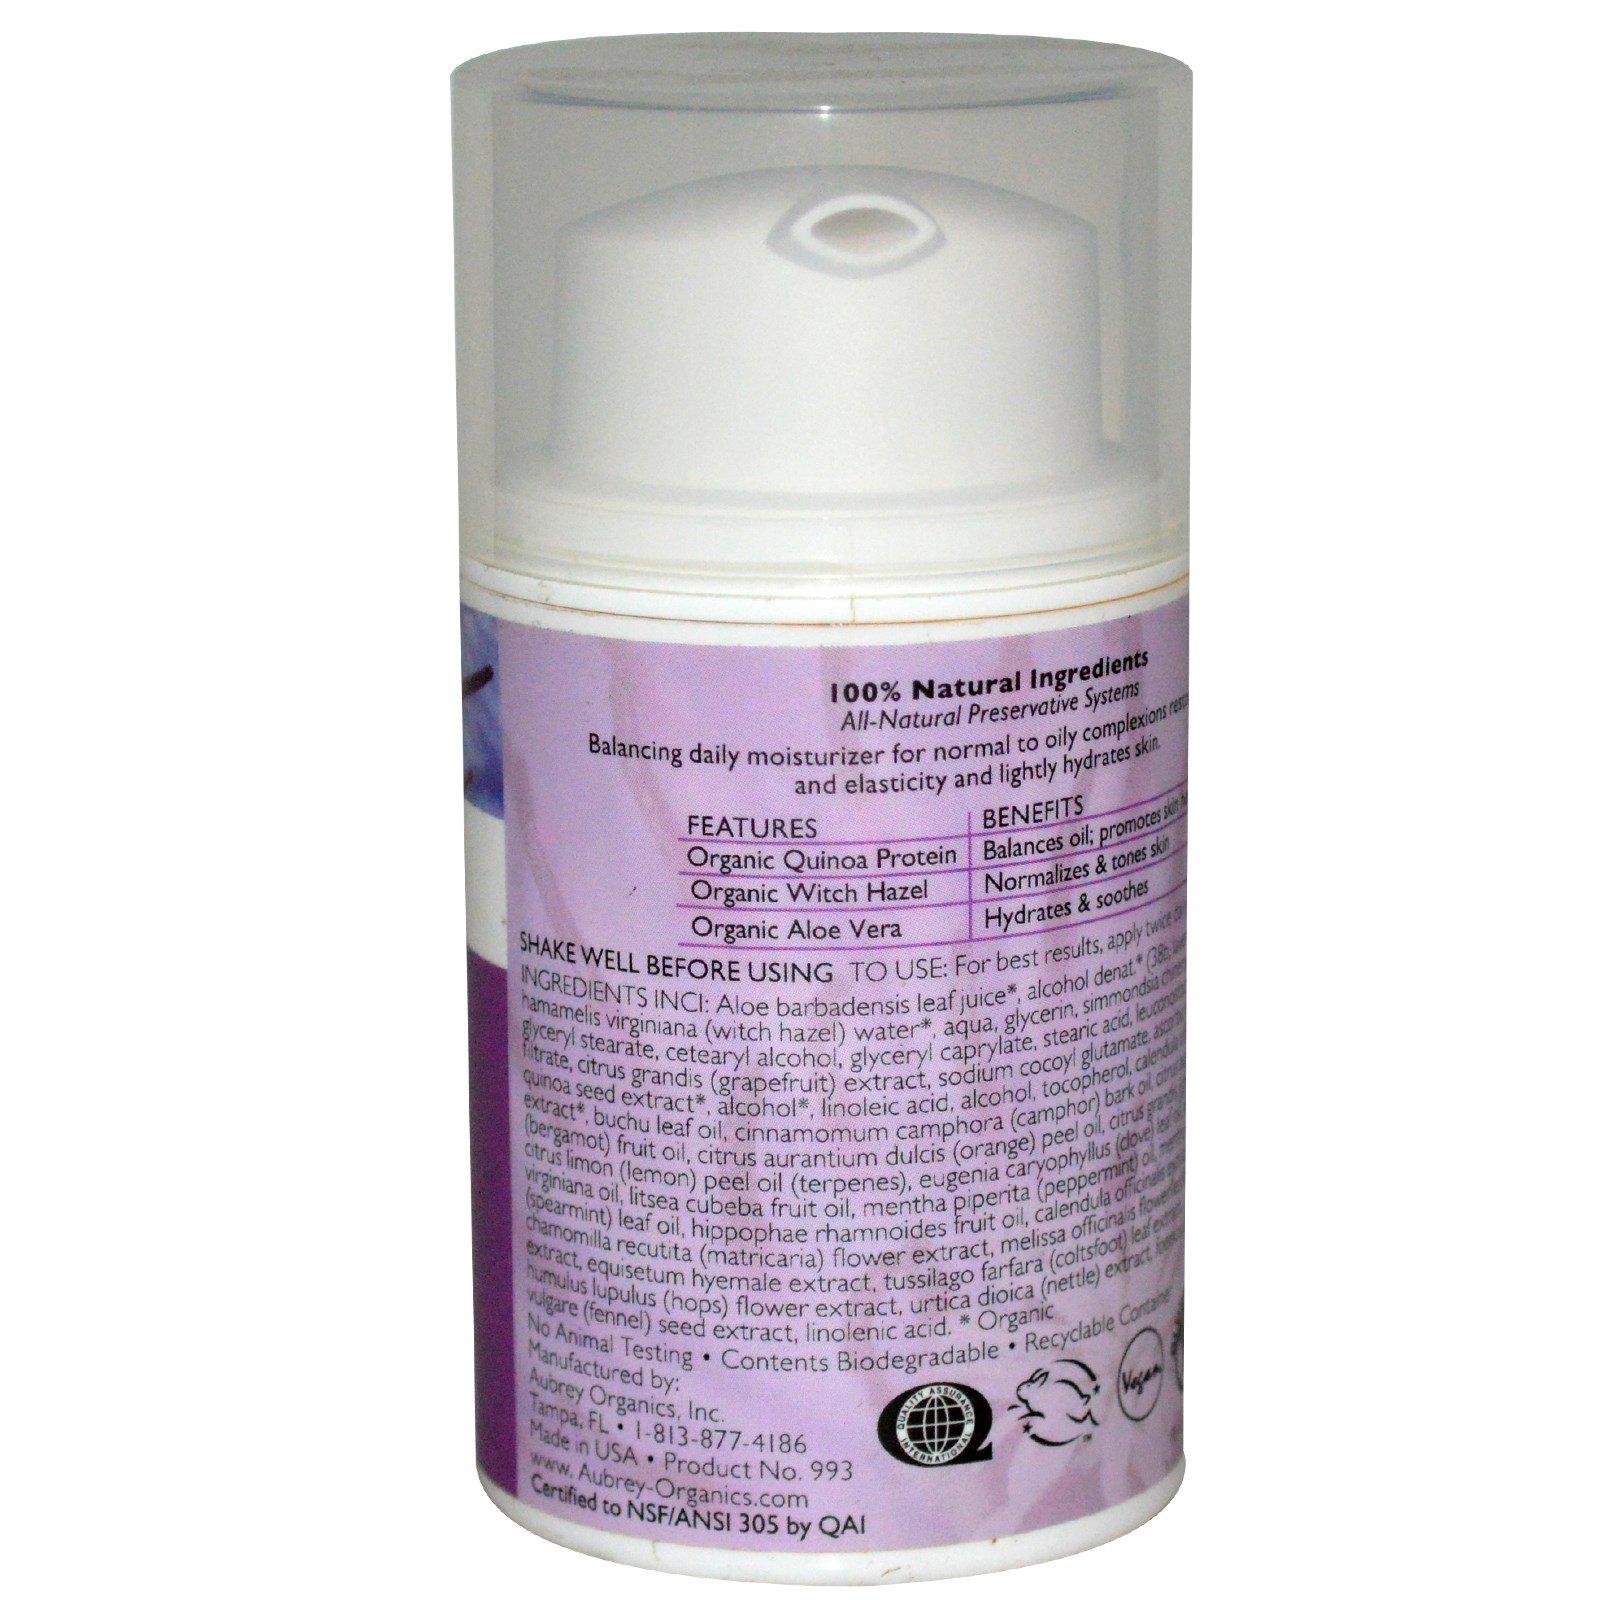 Aubrey Organics - EveryDay Basics Moisturizer, Normal/Dry Skin, 1.7 fl oz (50 ml) - 3 Packs BCL Spa Manicure Pedicure Hands Feet Body Soak/Scrub/Mask/Cream Mandarin Orange 4ct